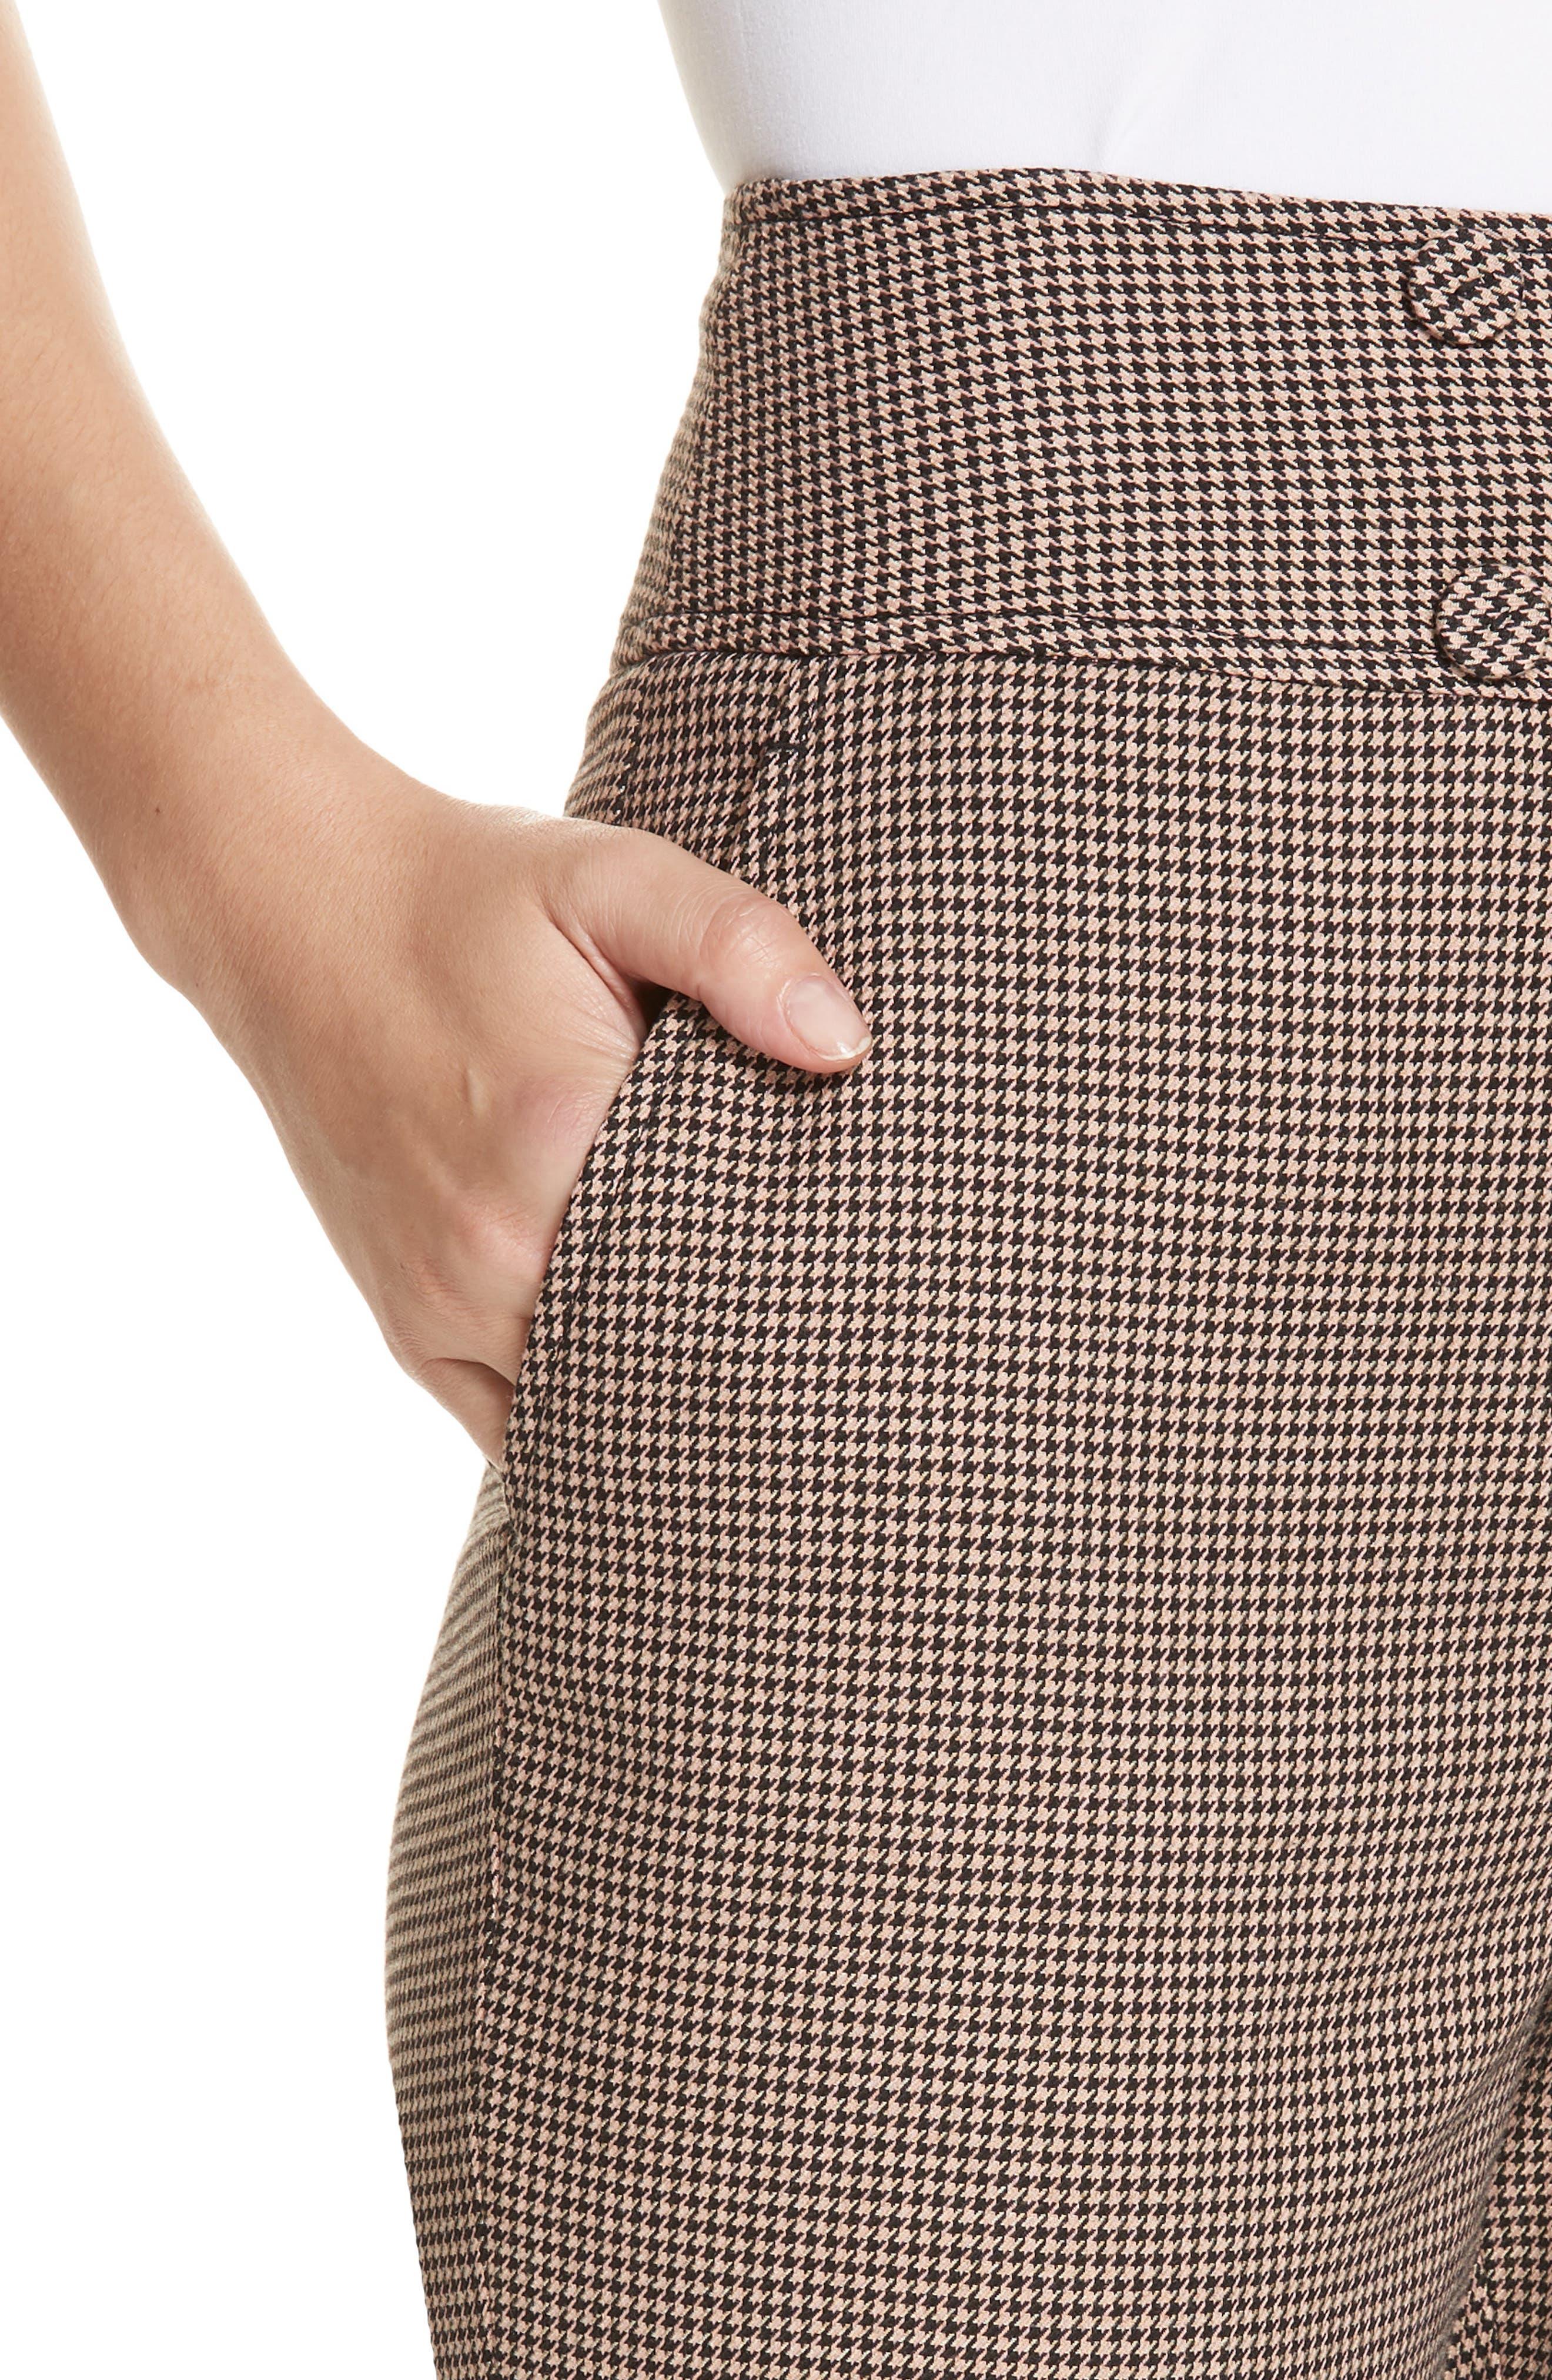 Houndstooth Check Stretch Cotton Blend Pants,                             Alternate thumbnail 4, color,                             CAMEL/ BLACK